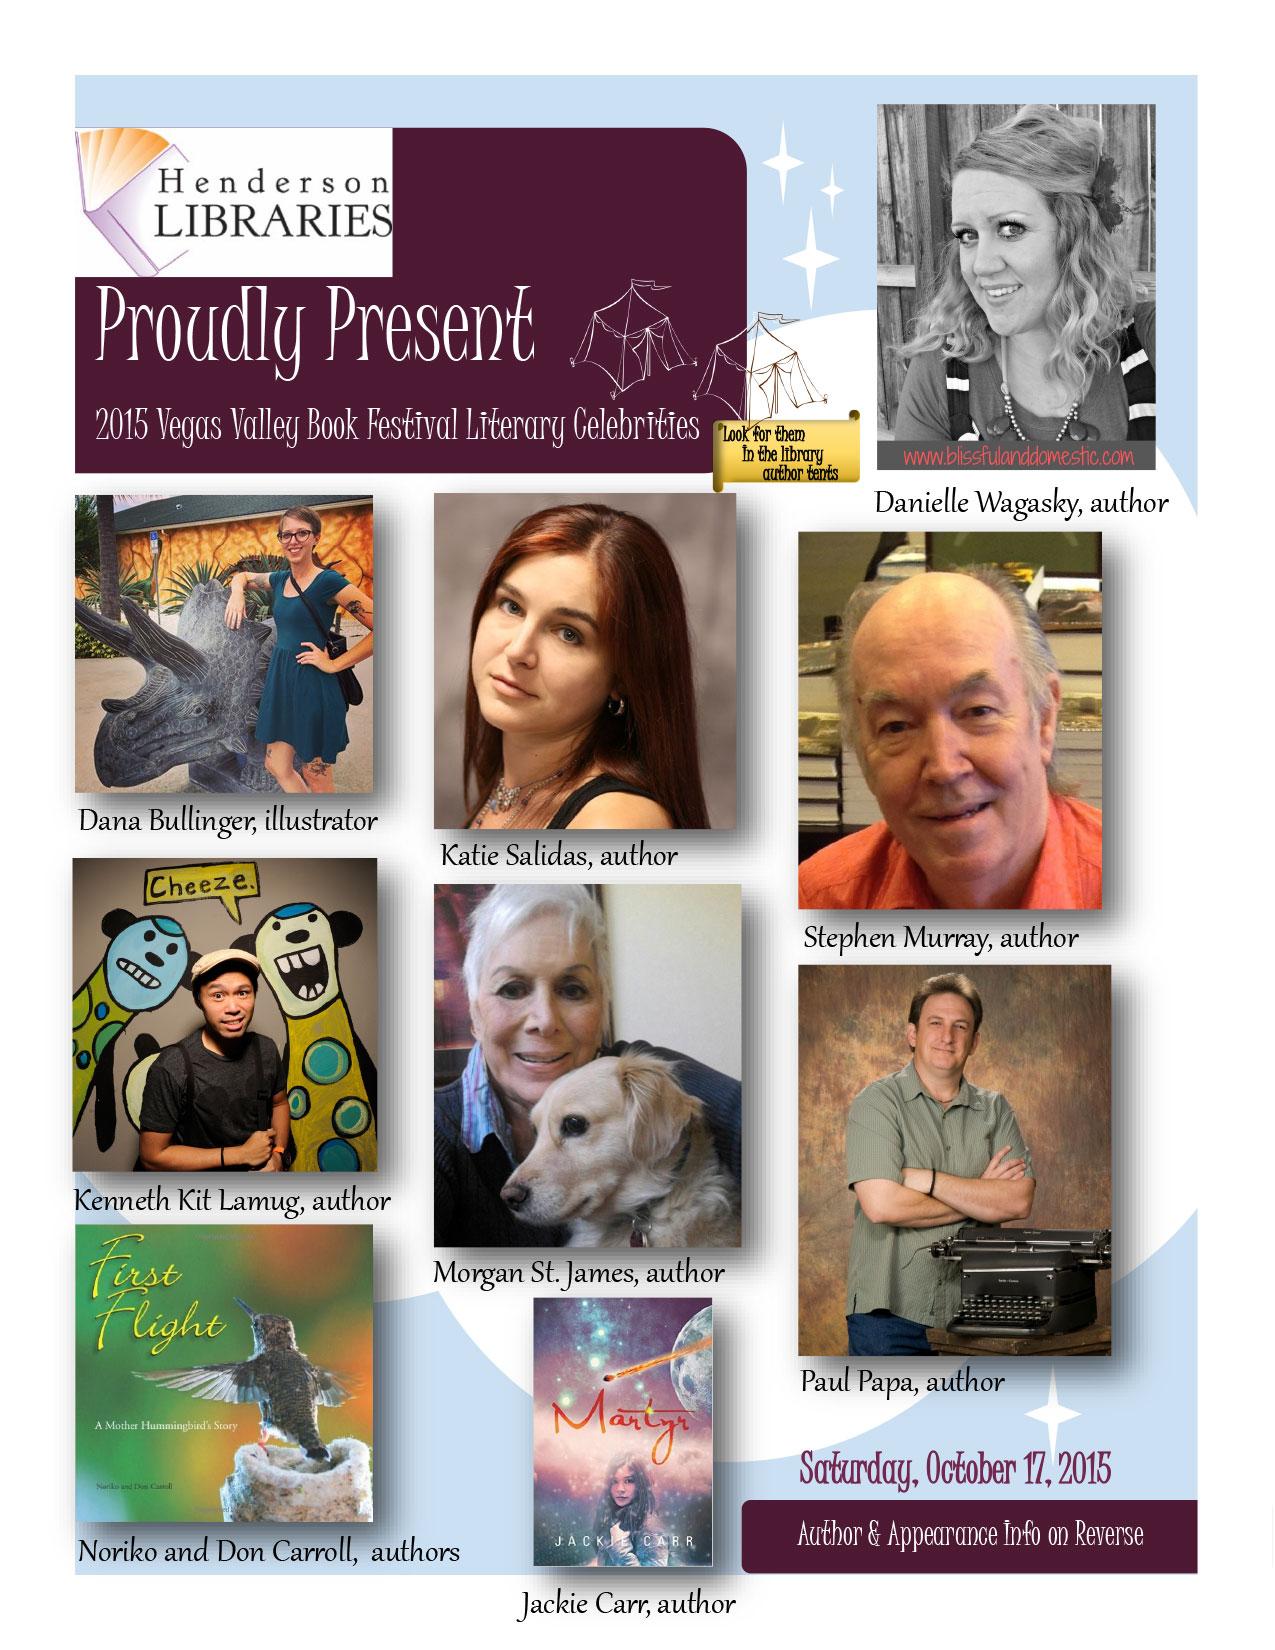 author-info-sheet-vegas-valley-book-festival